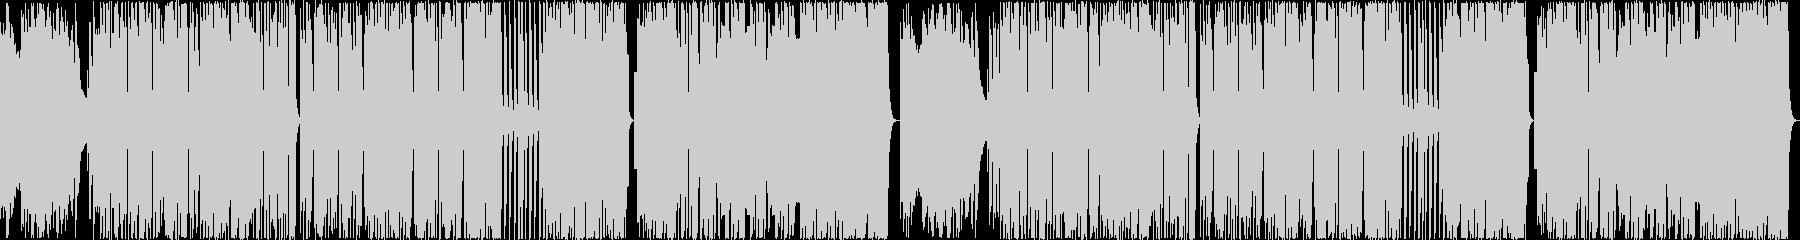 8bit:熱い:男:戦い【ループ】の未再生の波形